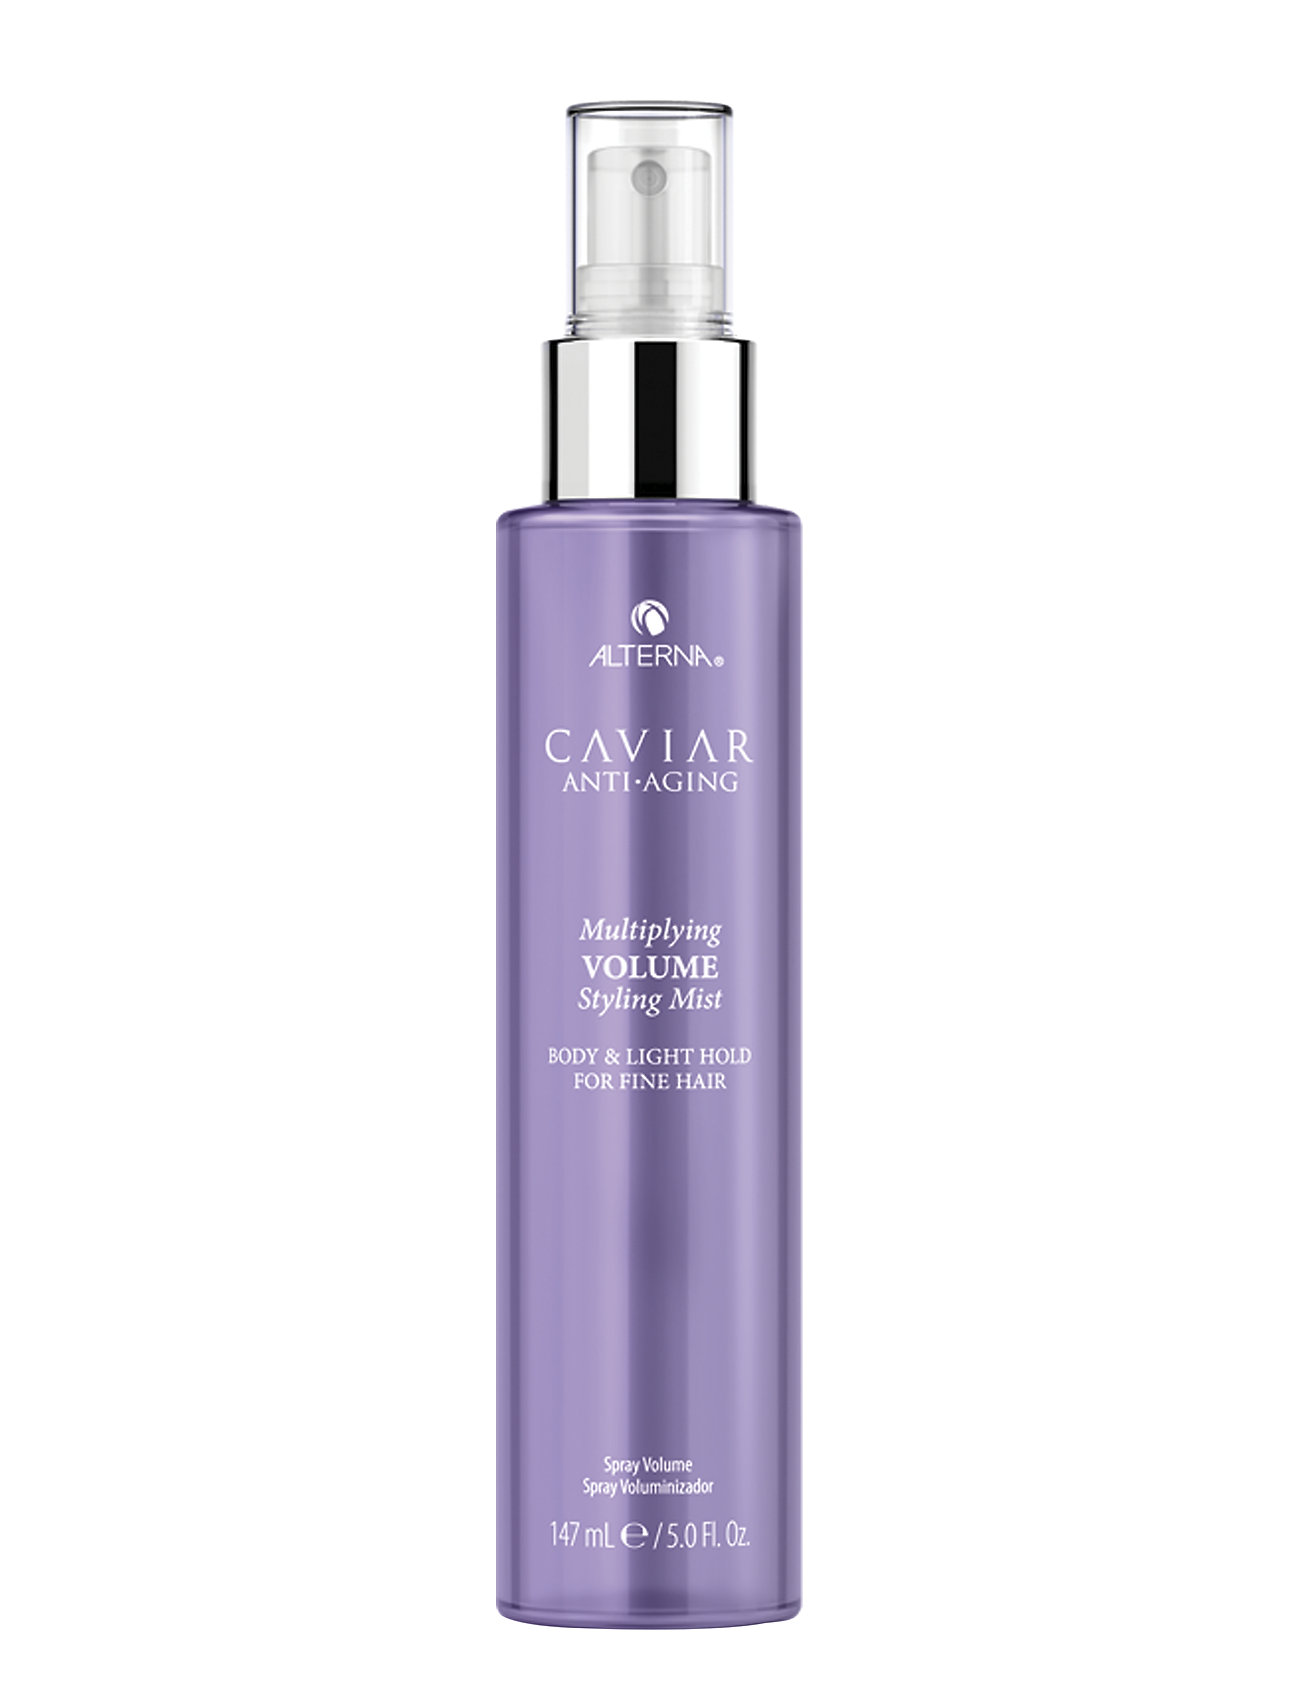 Image of Caviar Anti-Aging Multiplying Volume Multiplying Volume Styl Beauty WOMEN Hair Styling Hair Spray Alterna (3337003595)